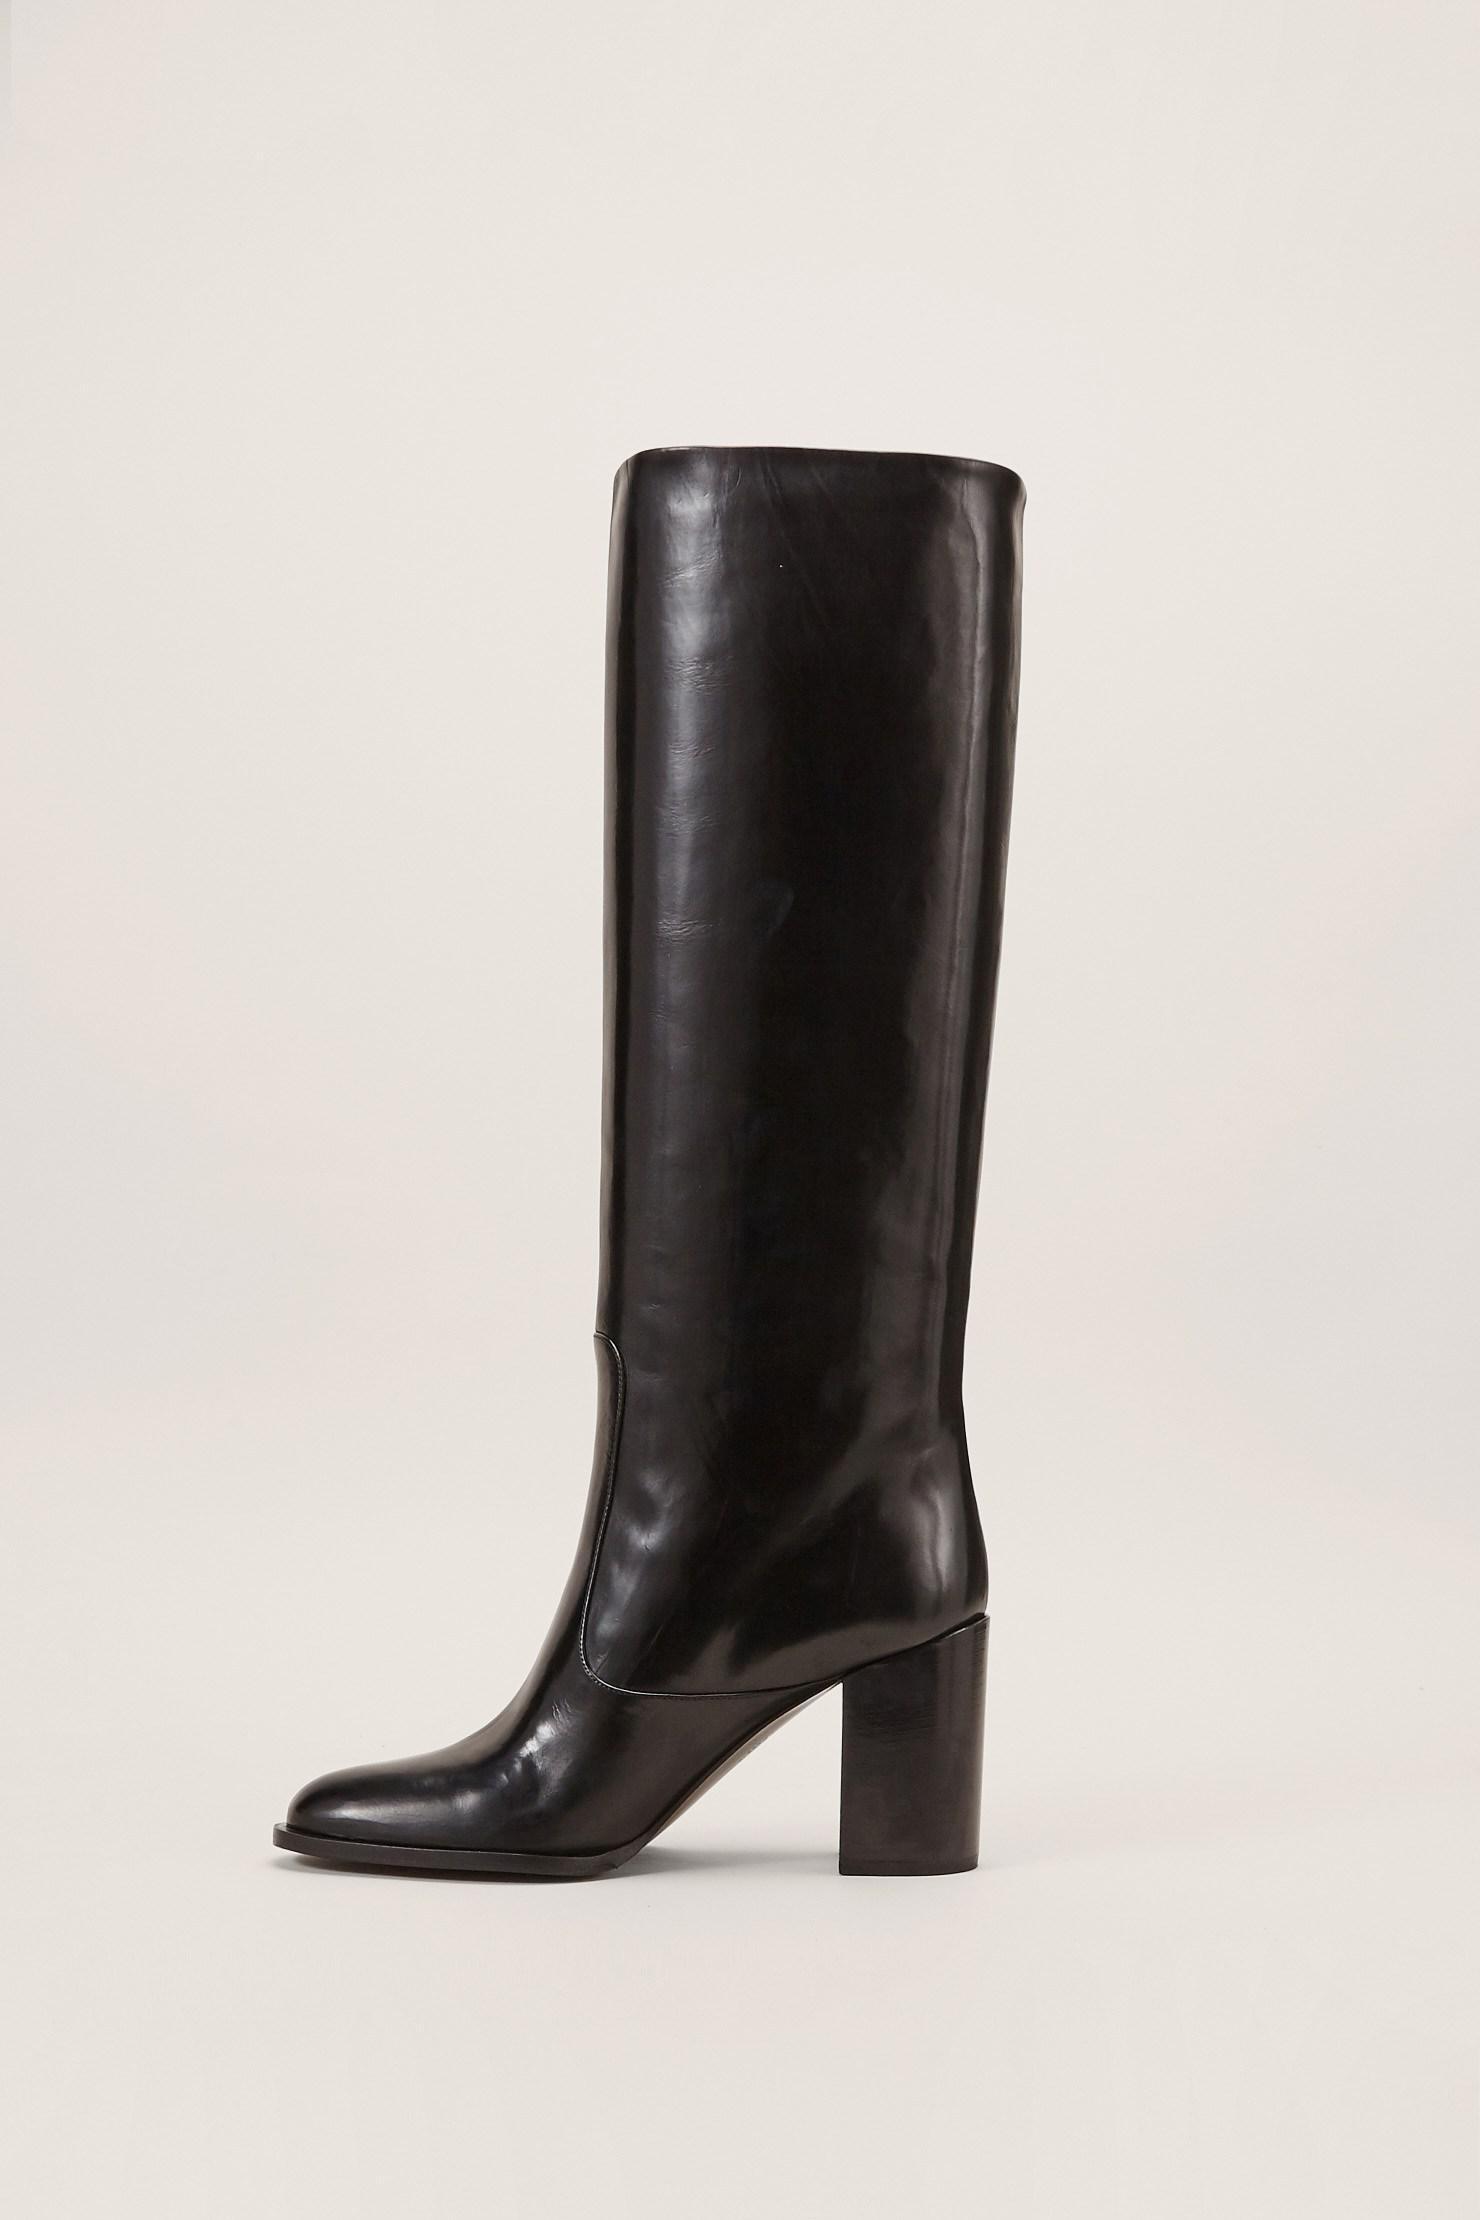 Veronique Branquinho Leather Boots AcOFrAub5X